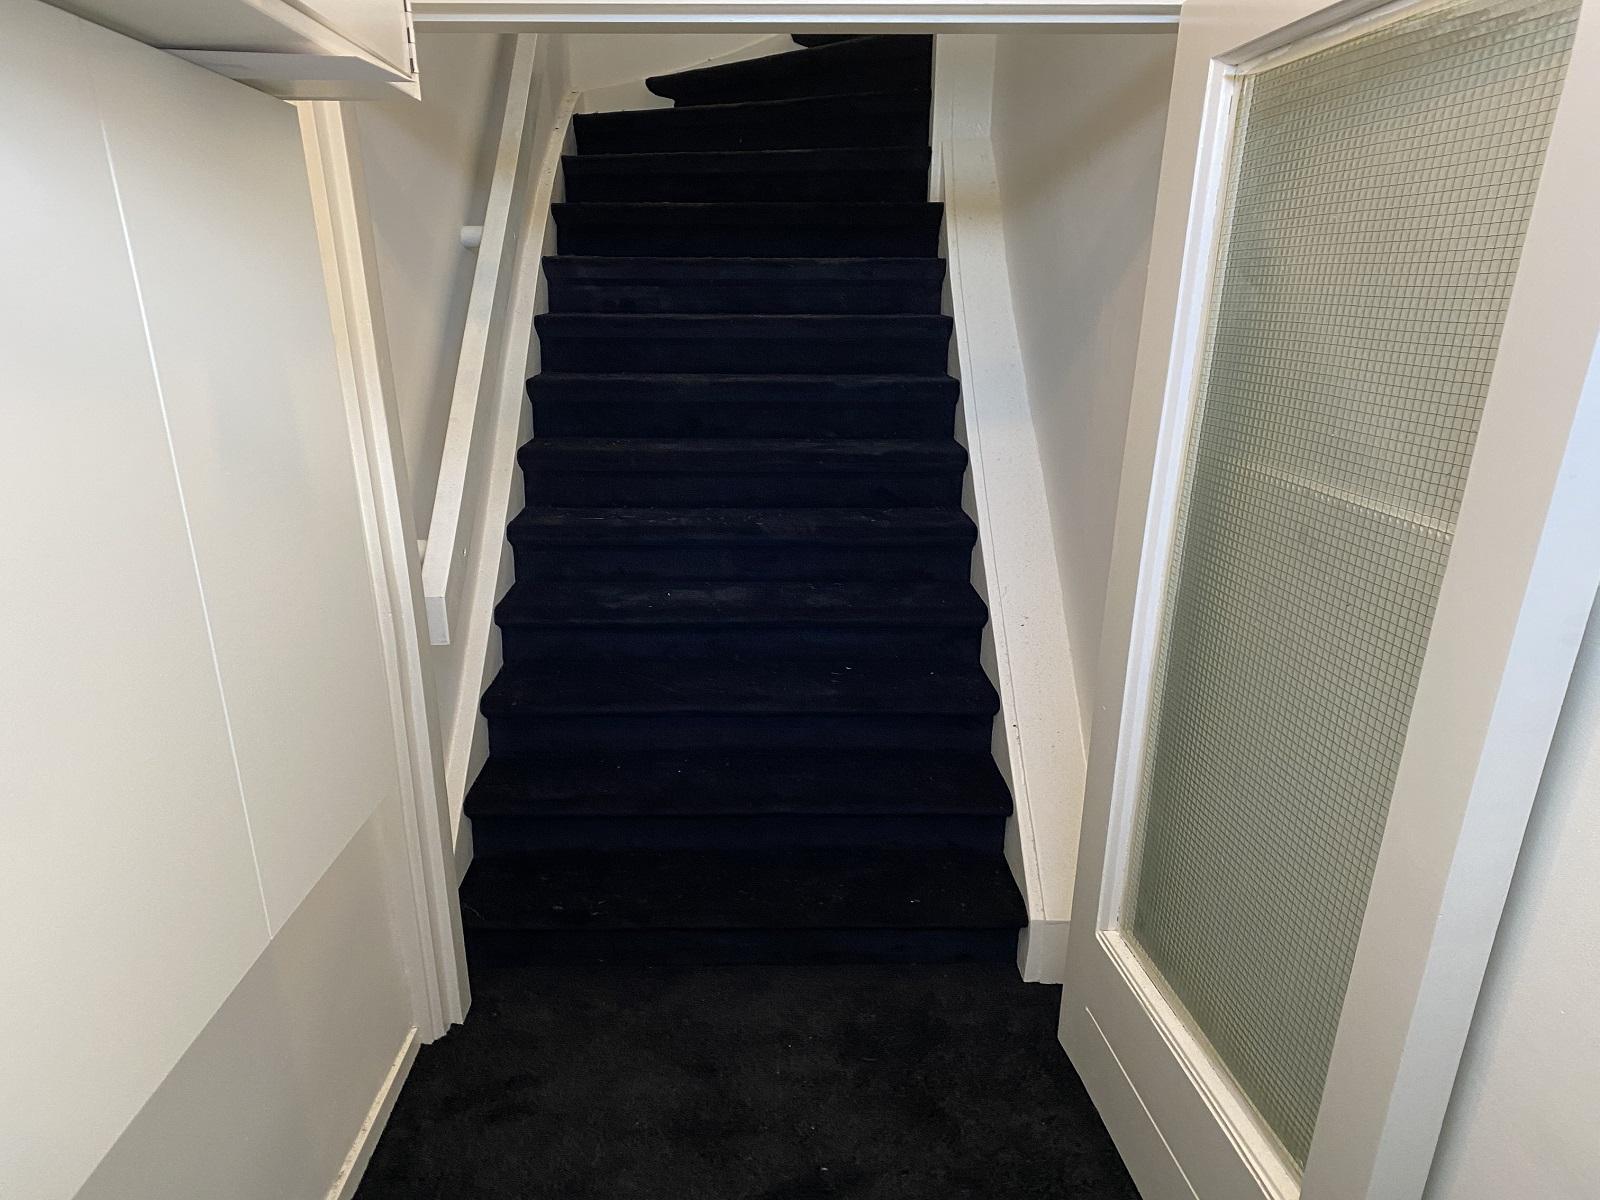 Bacovloeren trap en hal renovatie 4